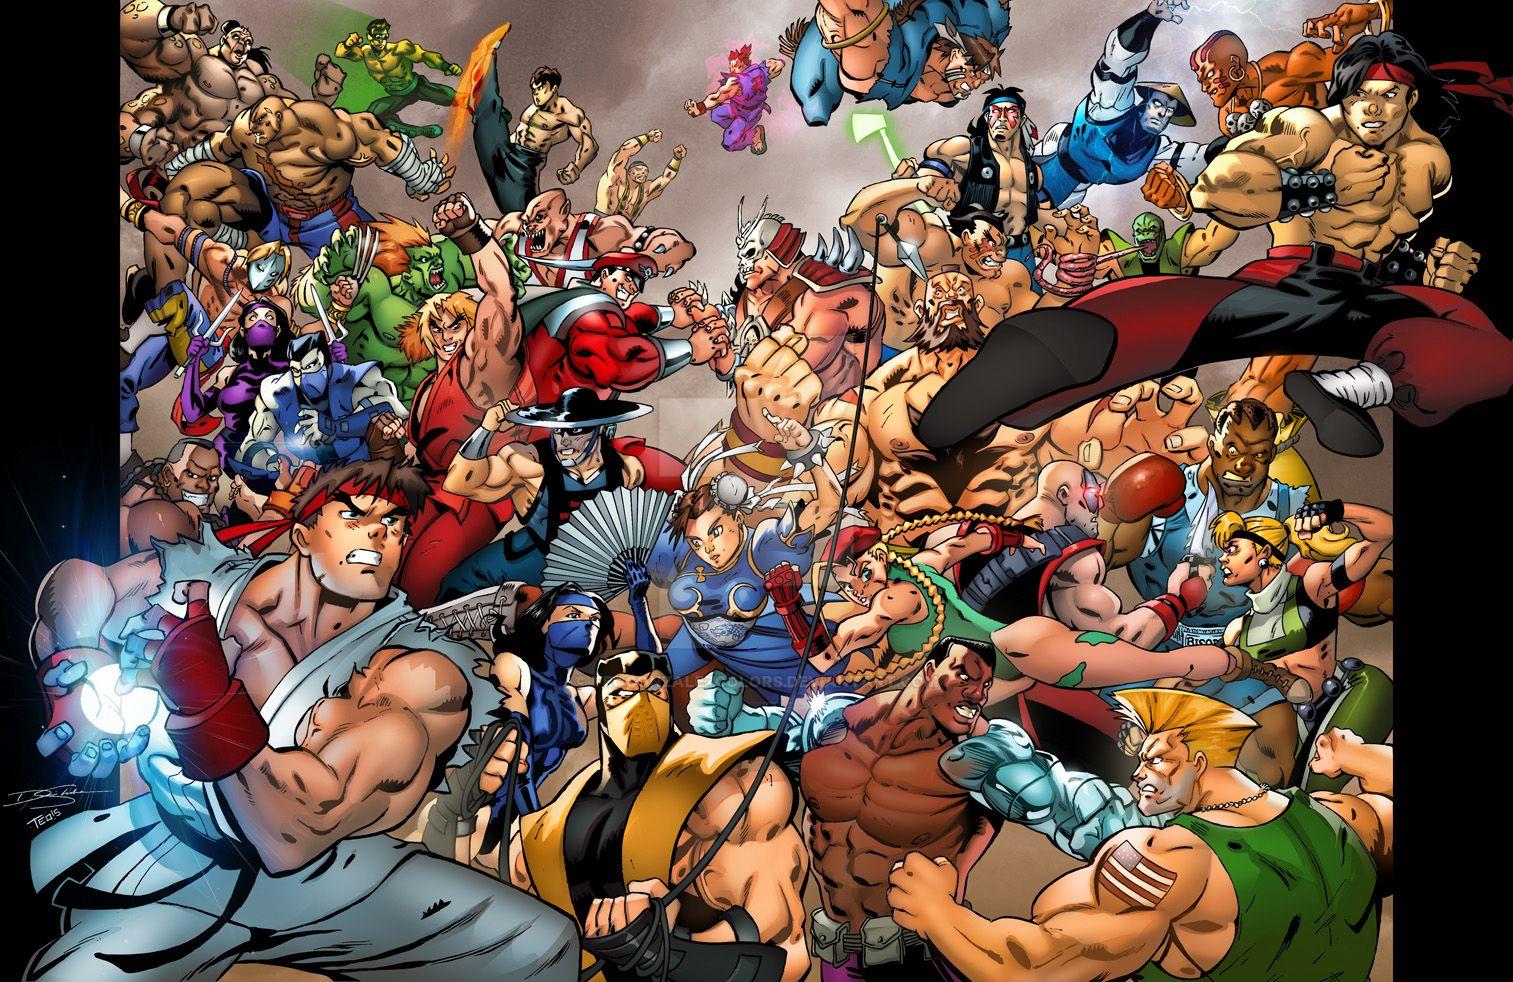 Sagat Kintaro from Mortal Kombat by salimano3 on DeviantArt